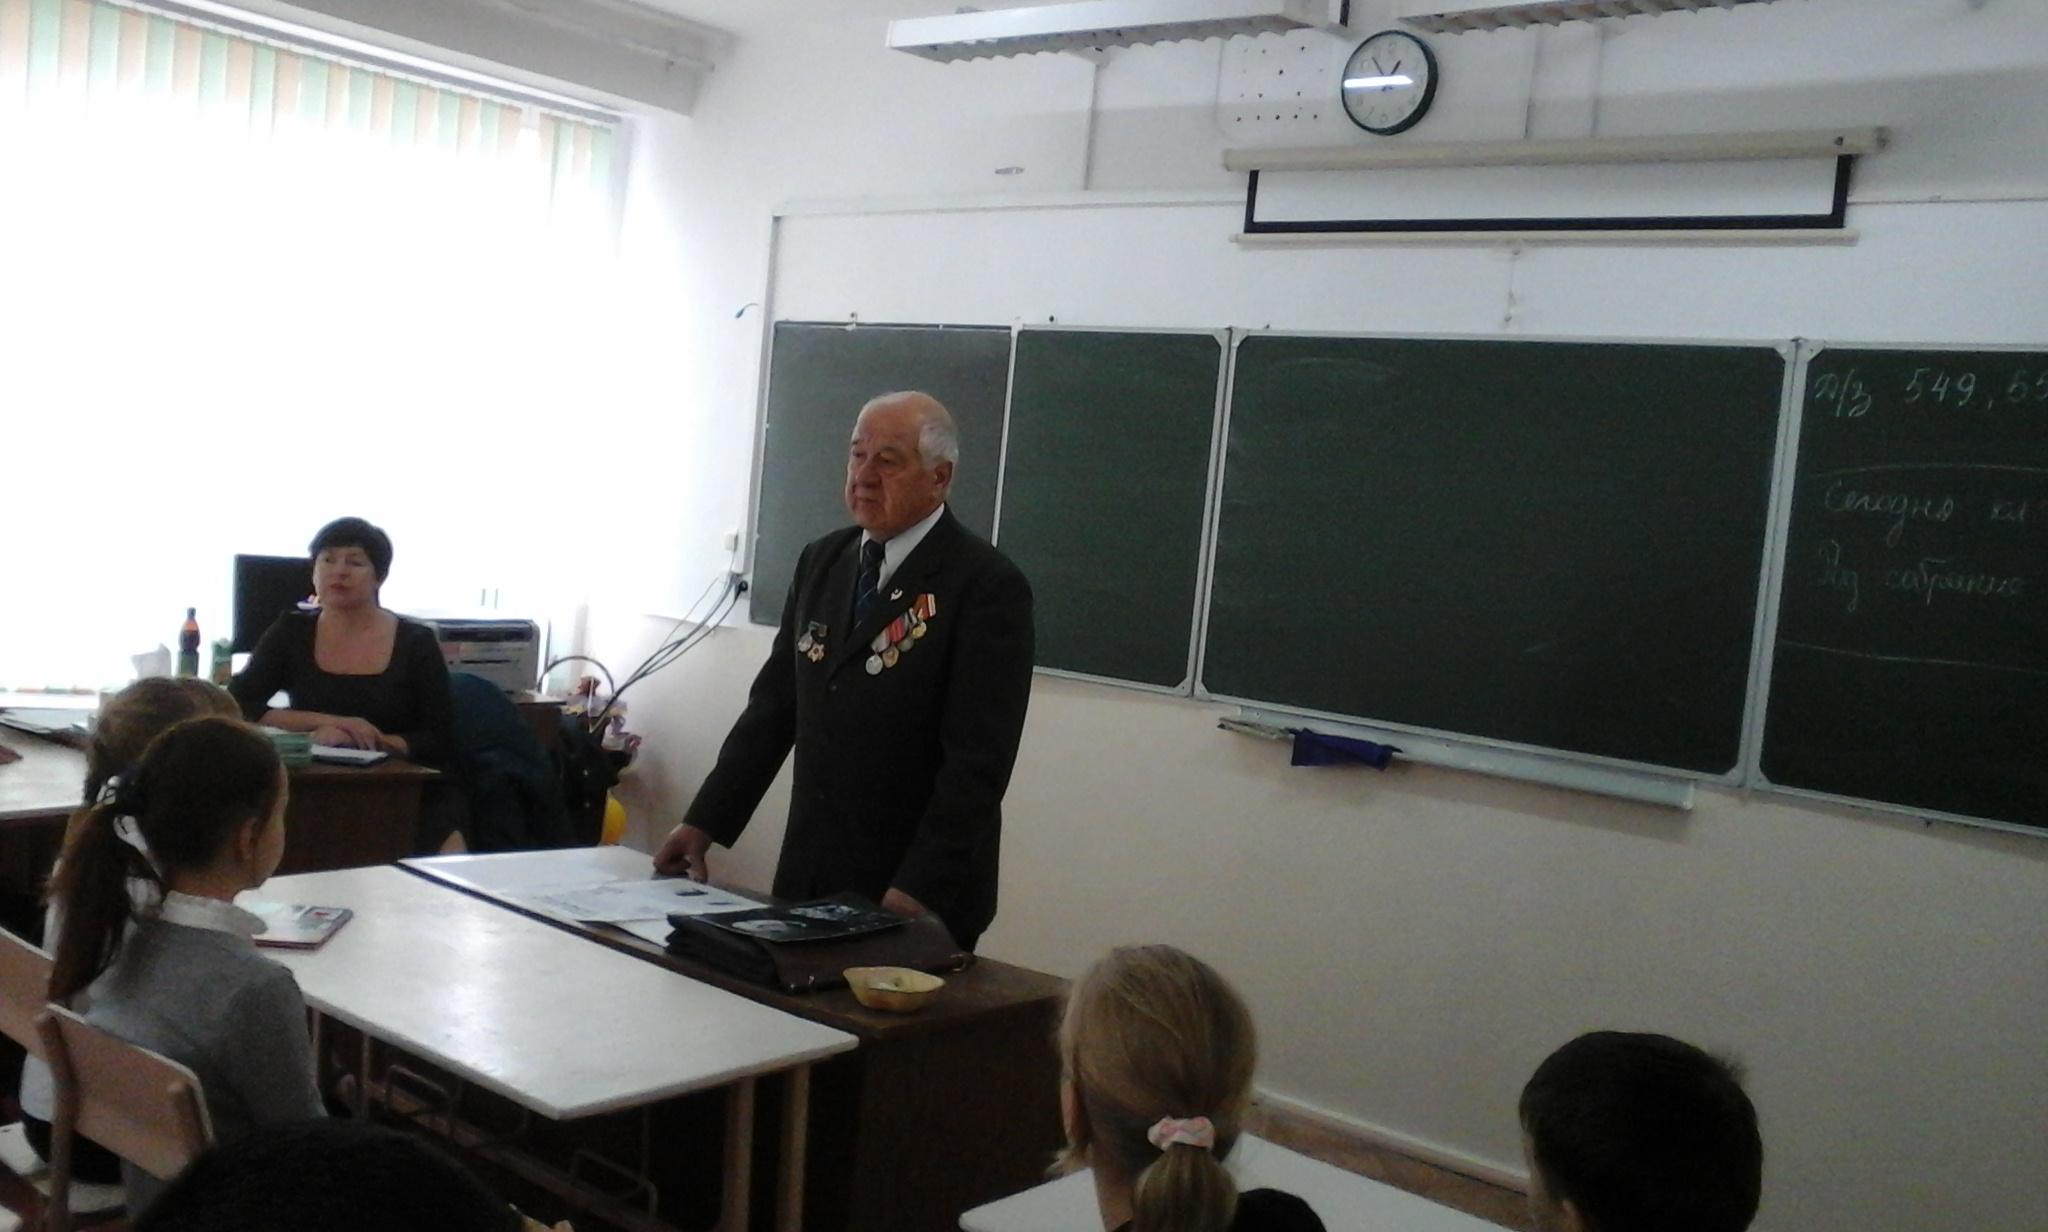 Шамиль хайбуллин мегион ветеран труда фото 3